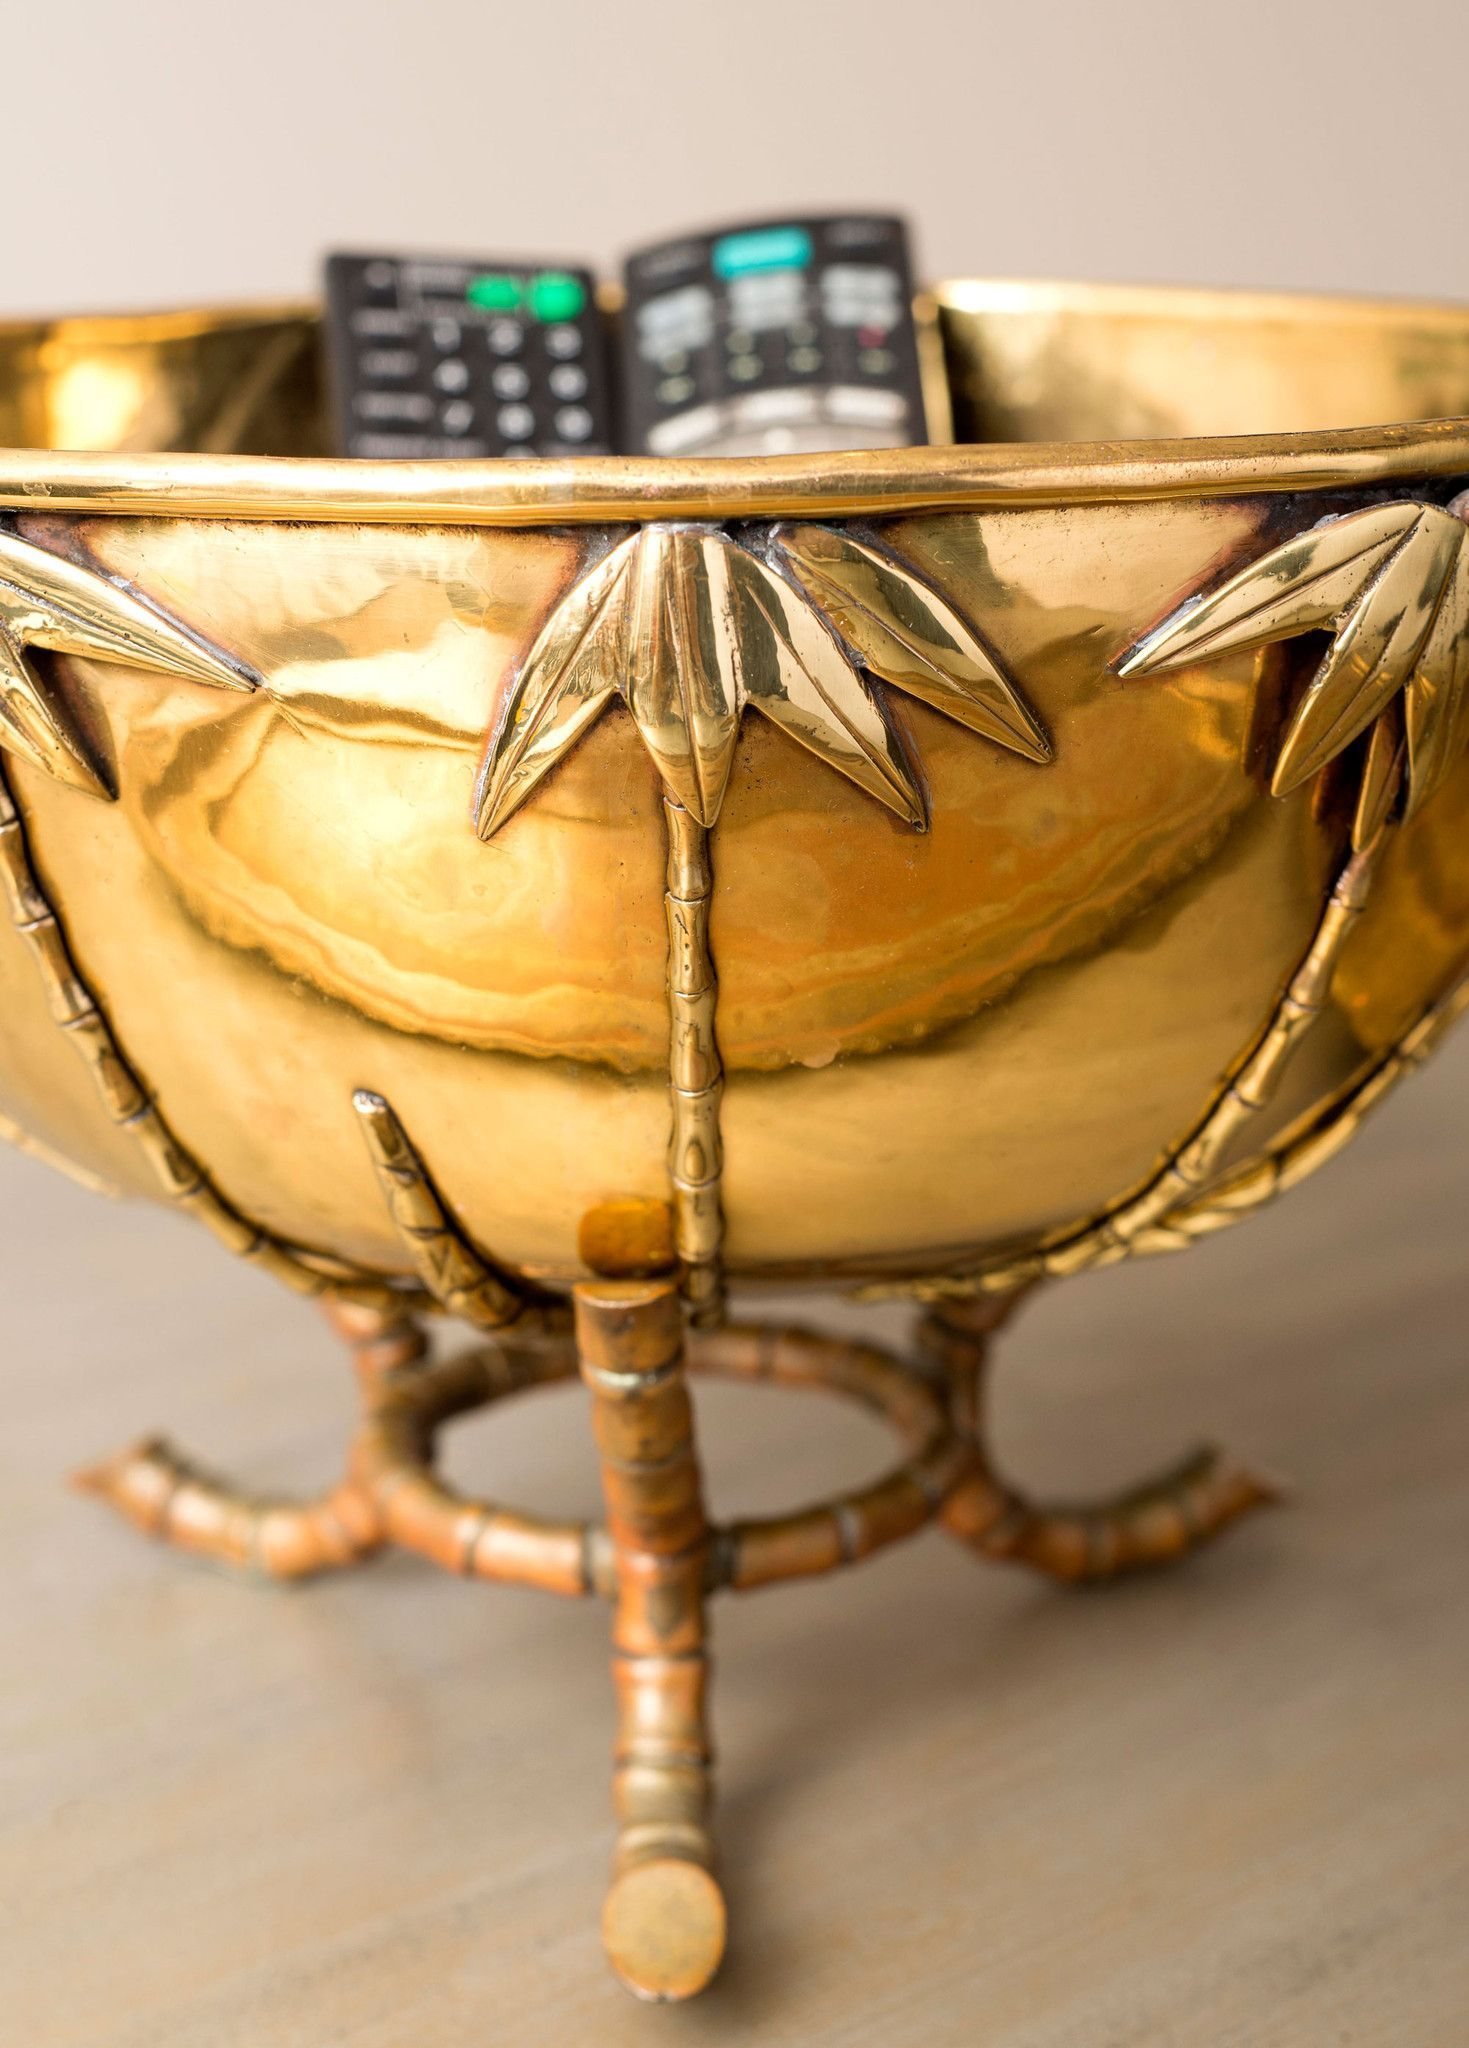 Hollywood bowl baskets